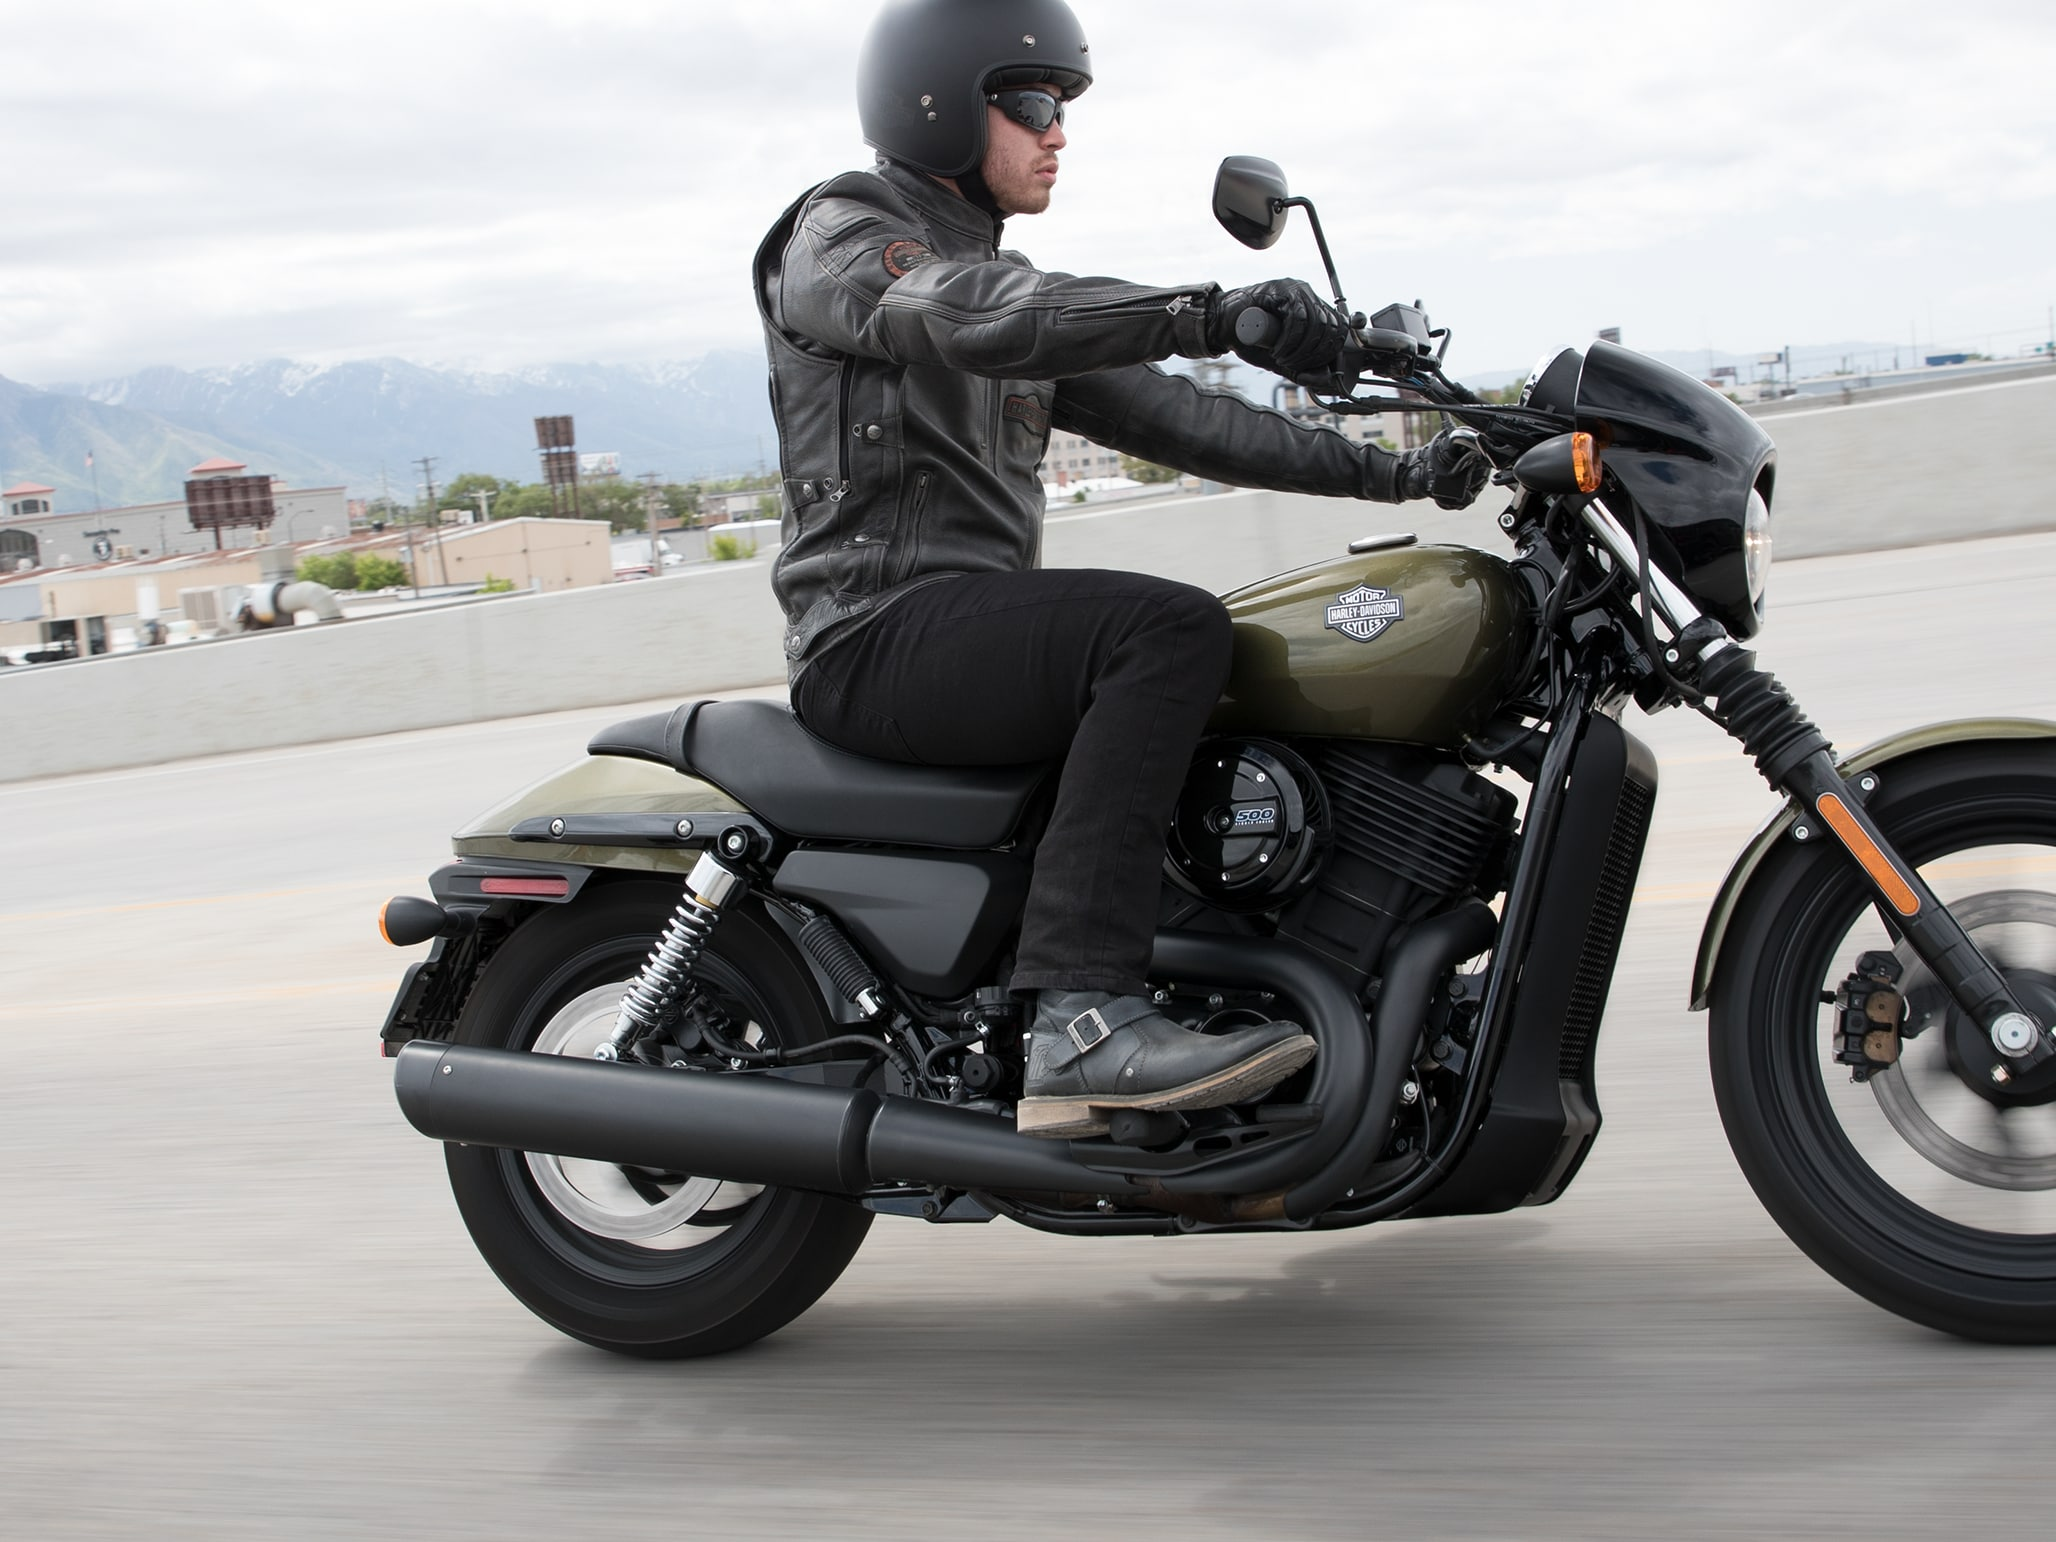 Harley 500 street